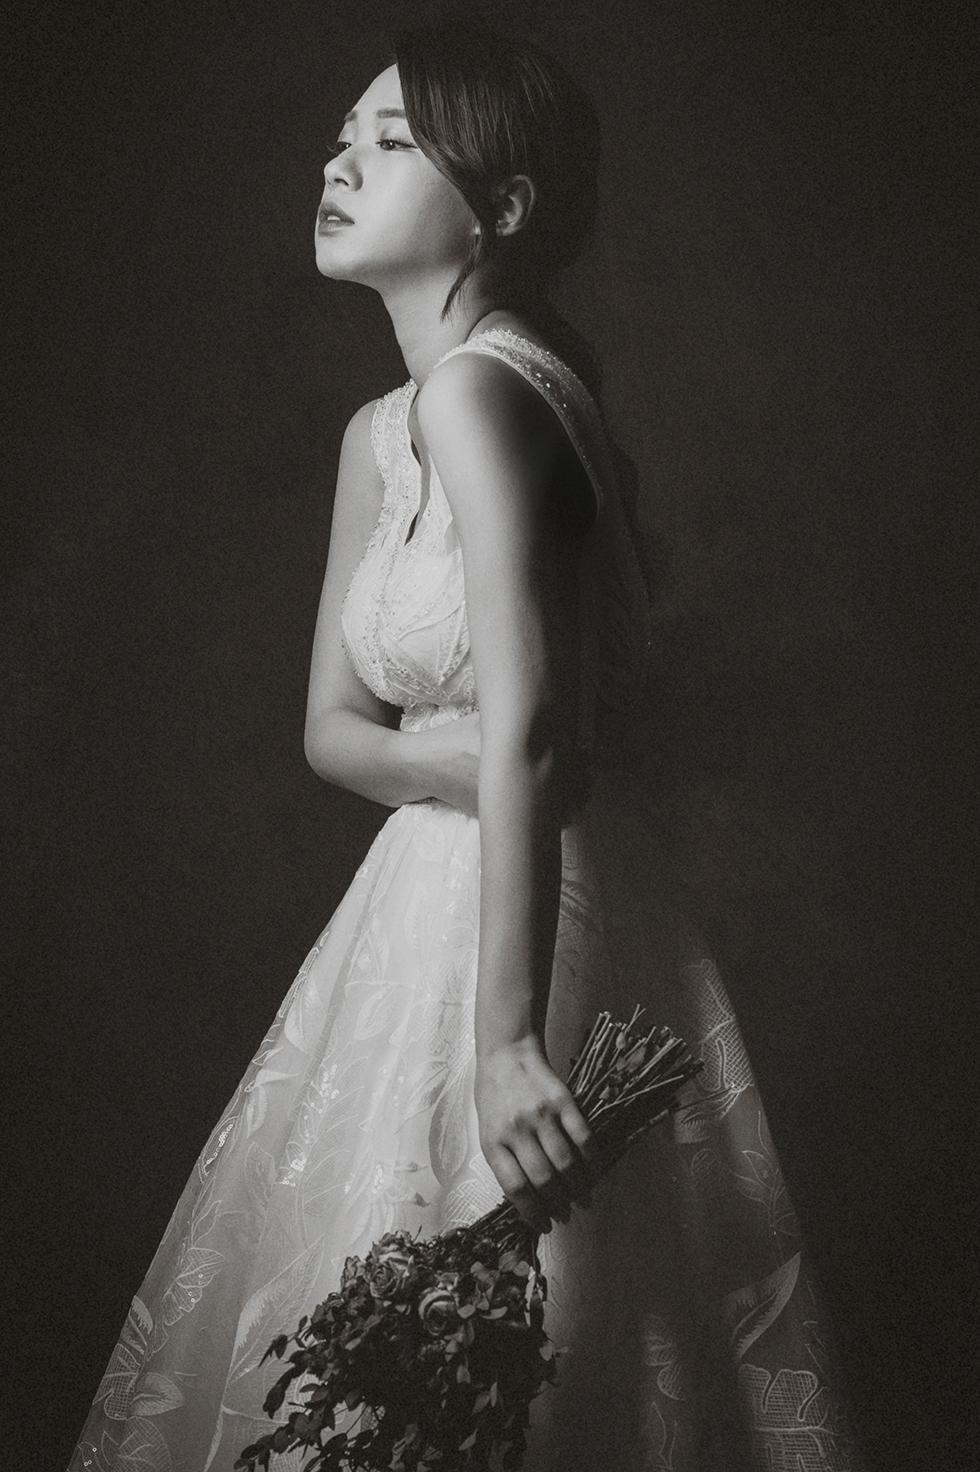 DSC_9487-1-1-1- 婚攝, 婚禮攝影, 婚紗包套, 婚禮紀錄, 親子寫真, 美式婚紗攝影, 自助婚紗, 小資婚紗, 婚攝推薦, 家庭寫真, 孕婦寫真, 顏氏牧場婚攝, 林酒店婚攝, 萊特薇庭婚攝, 婚攝推薦, 婚紗婚攝, 婚紗攝影, 婚禮攝影推薦, 自助婚紗